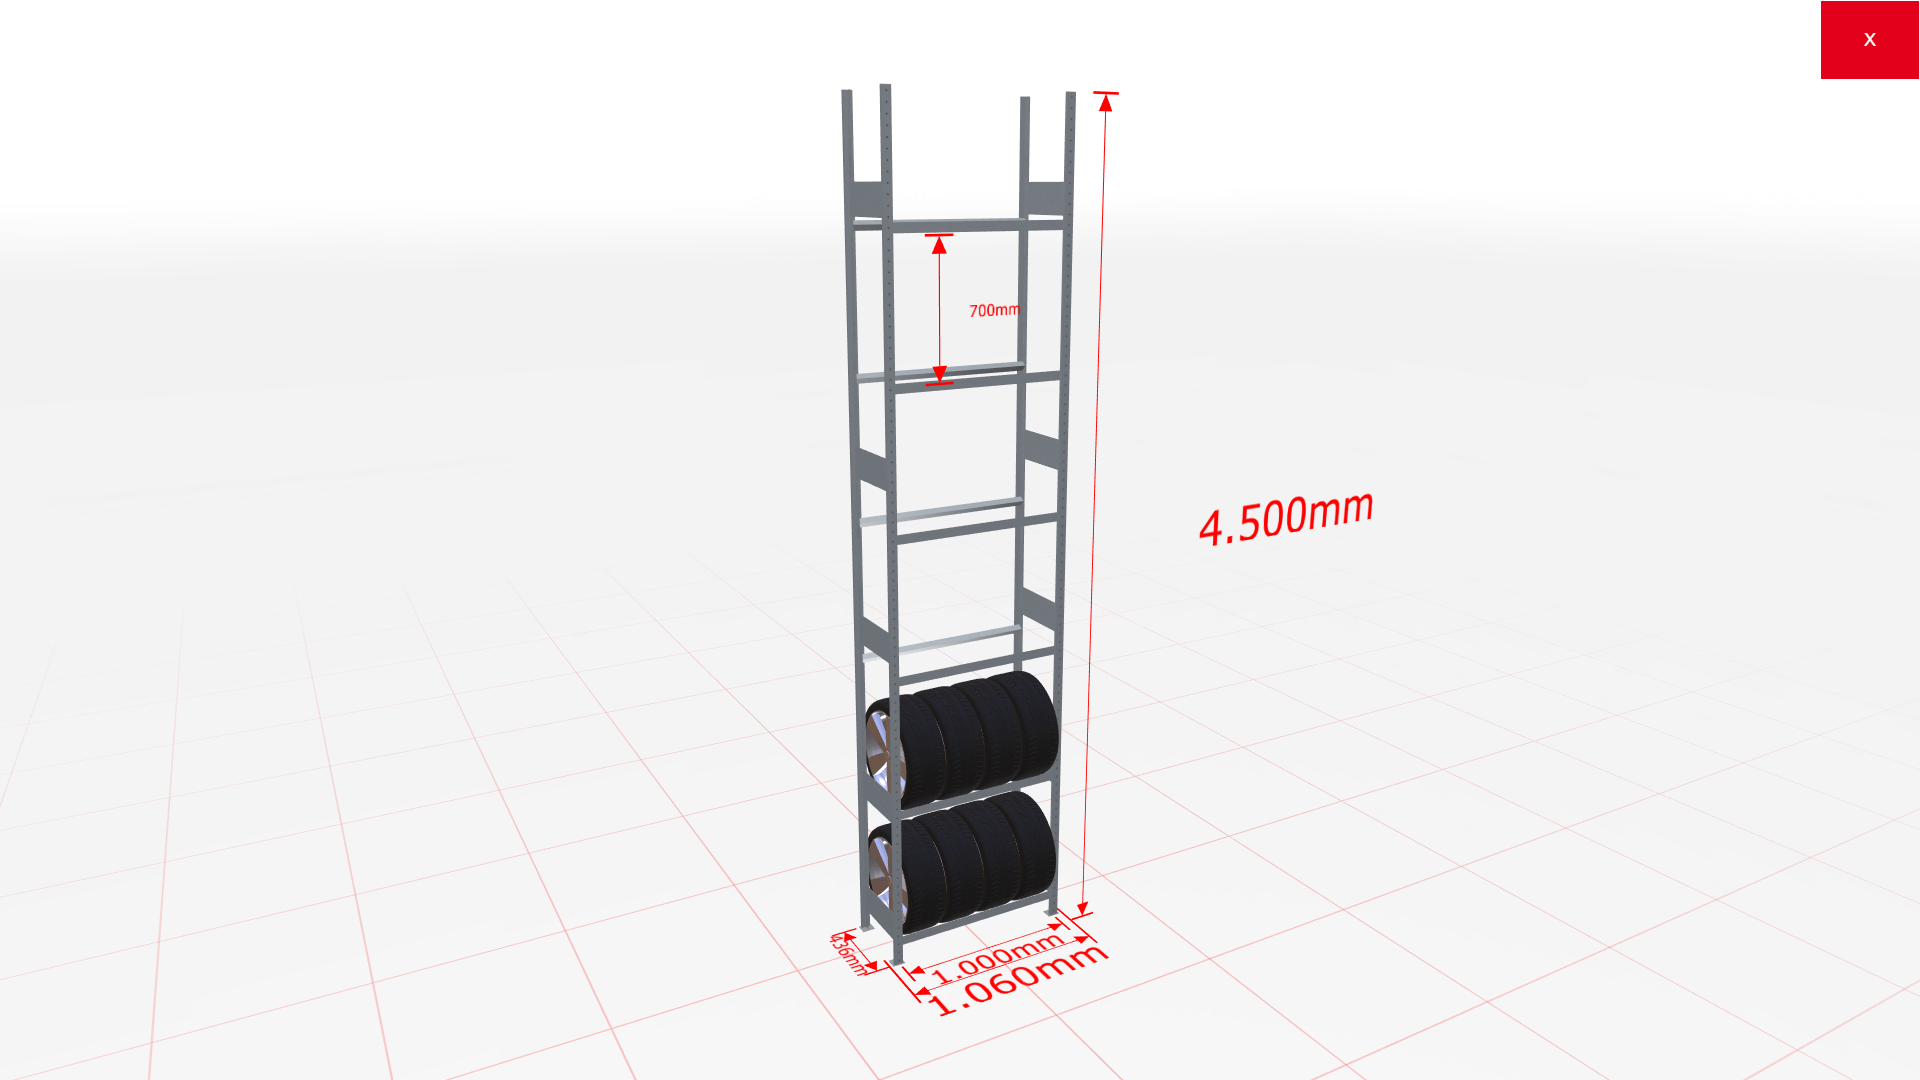 Räderregal Grundregal SCHULTE Lagertechnik 4500x1000x400 mm – 6 Ebenen á 1000 mm, verzinkt